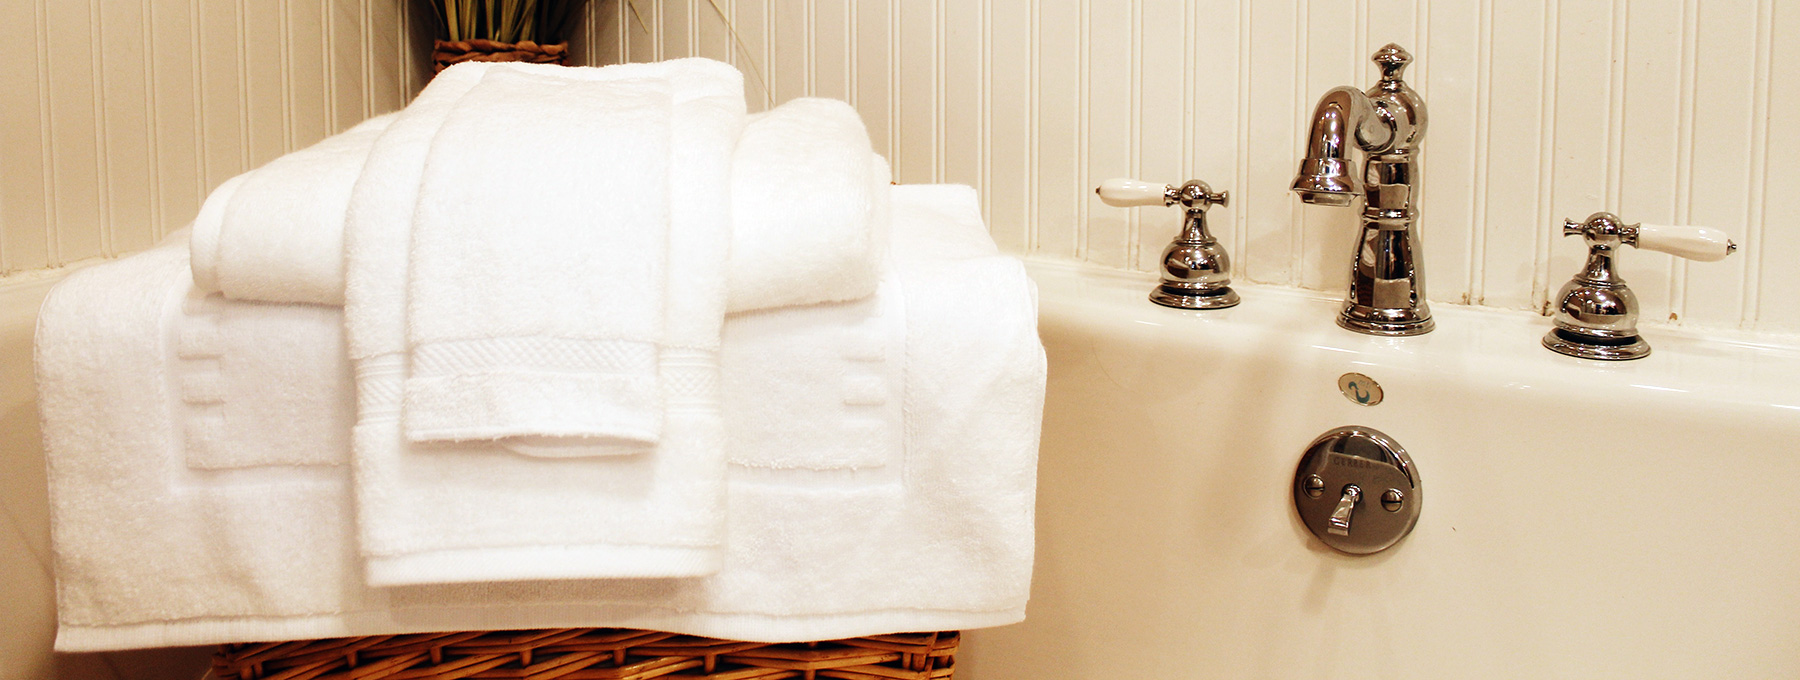 towelsslider